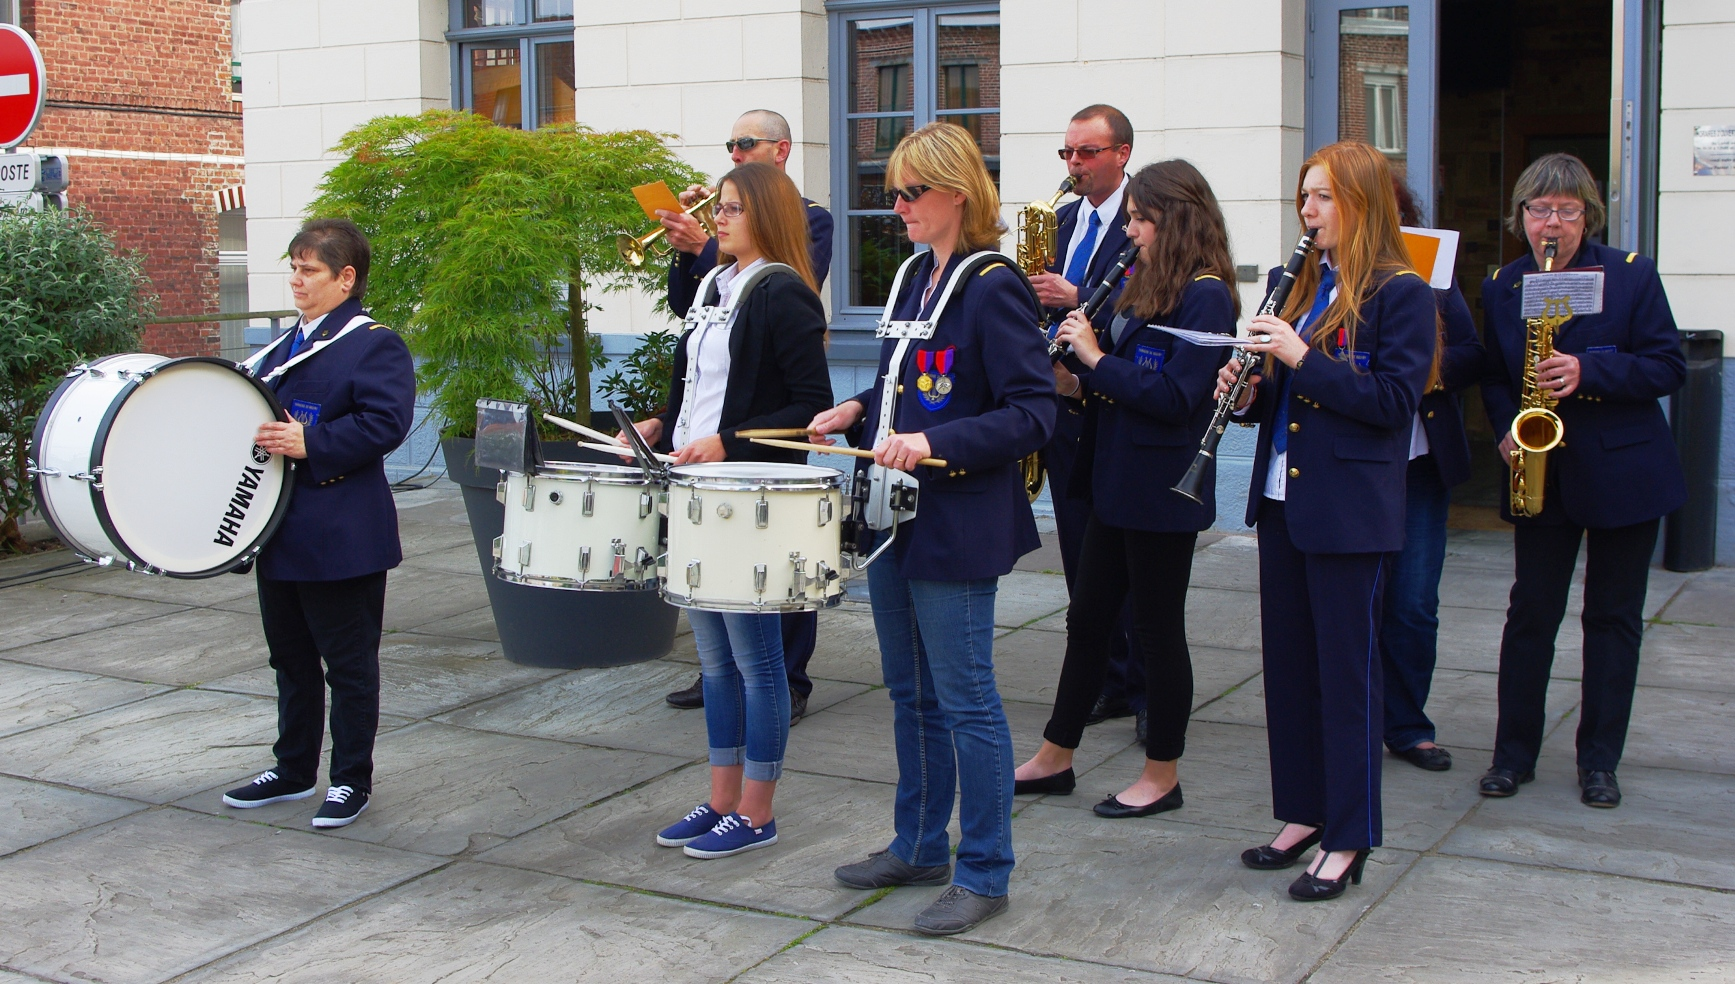 18 juin 2015 harmonie de Beuvry